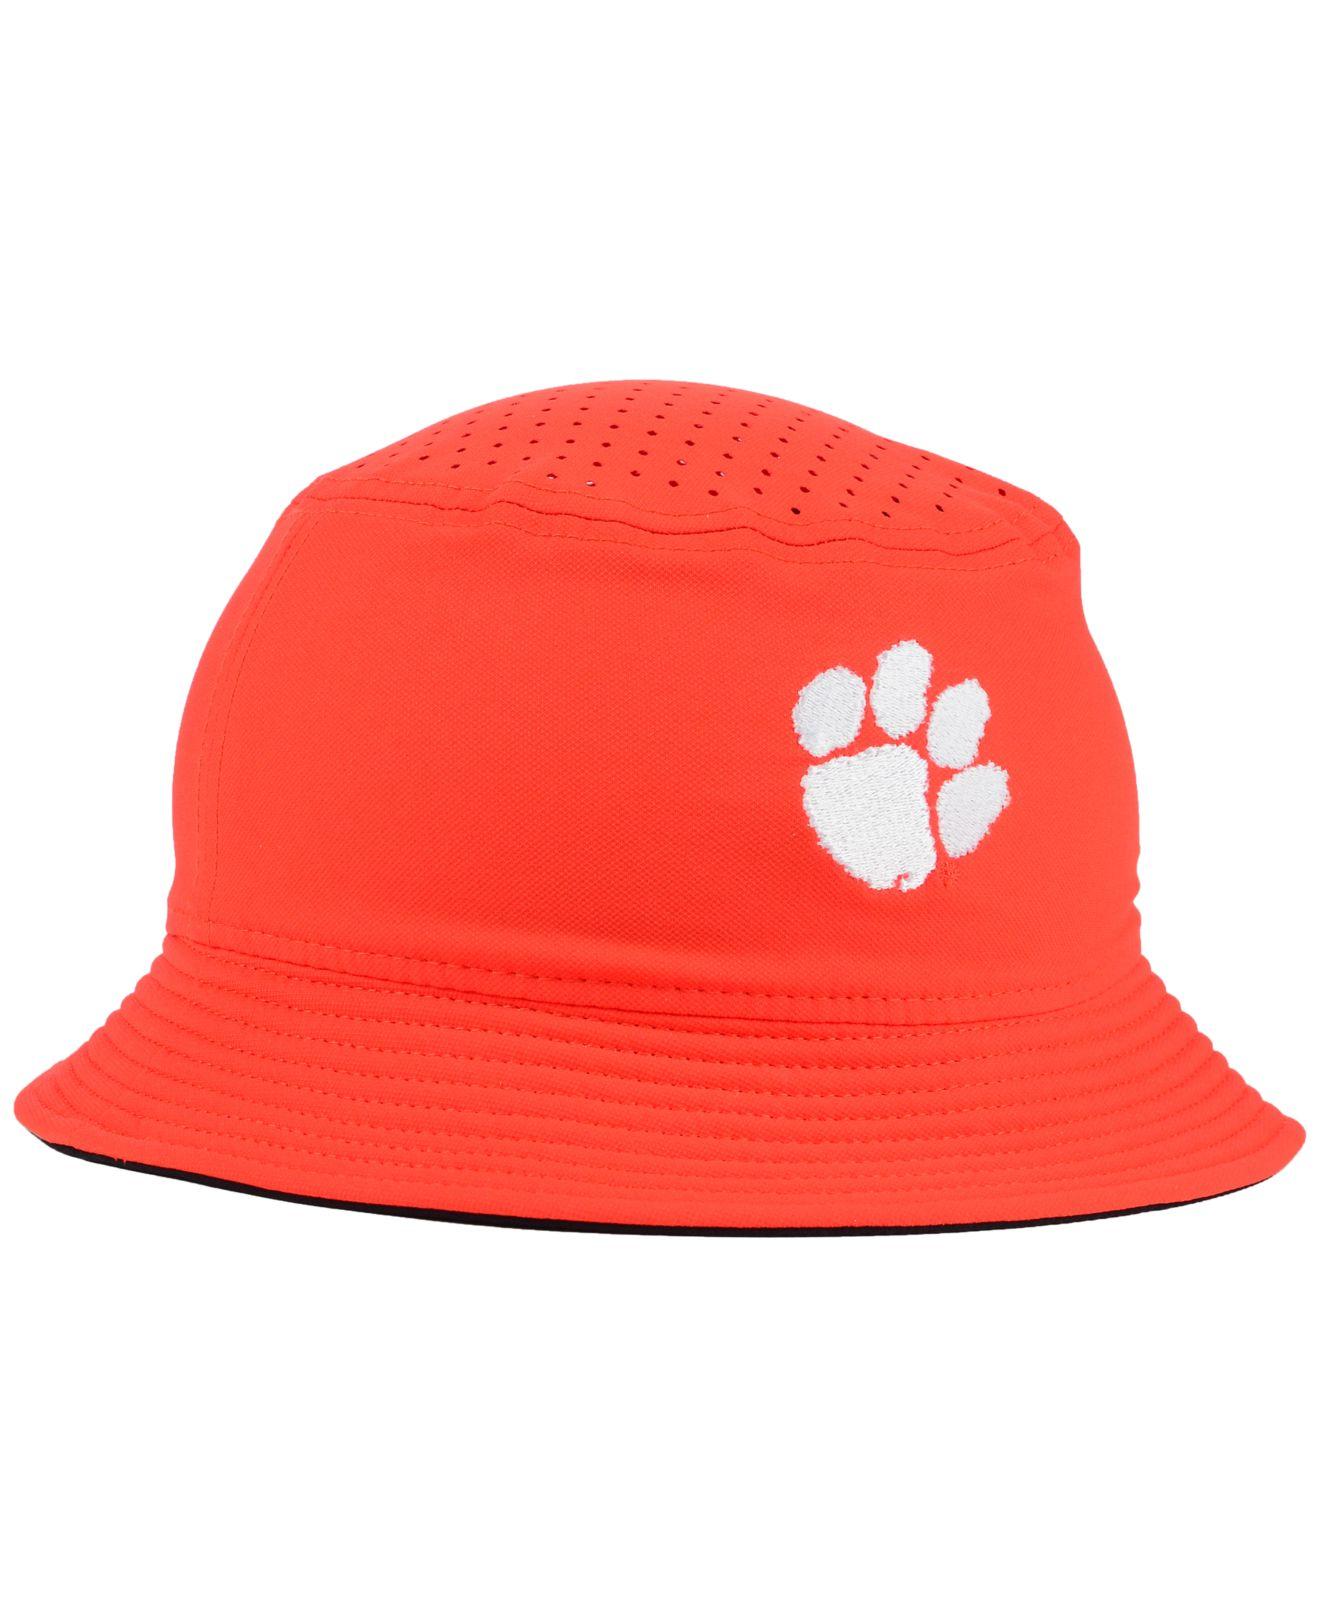 62204127afd ... hot lyst nike clemson tigers vapor bucket hat in orange for men 0a64c  b38a6